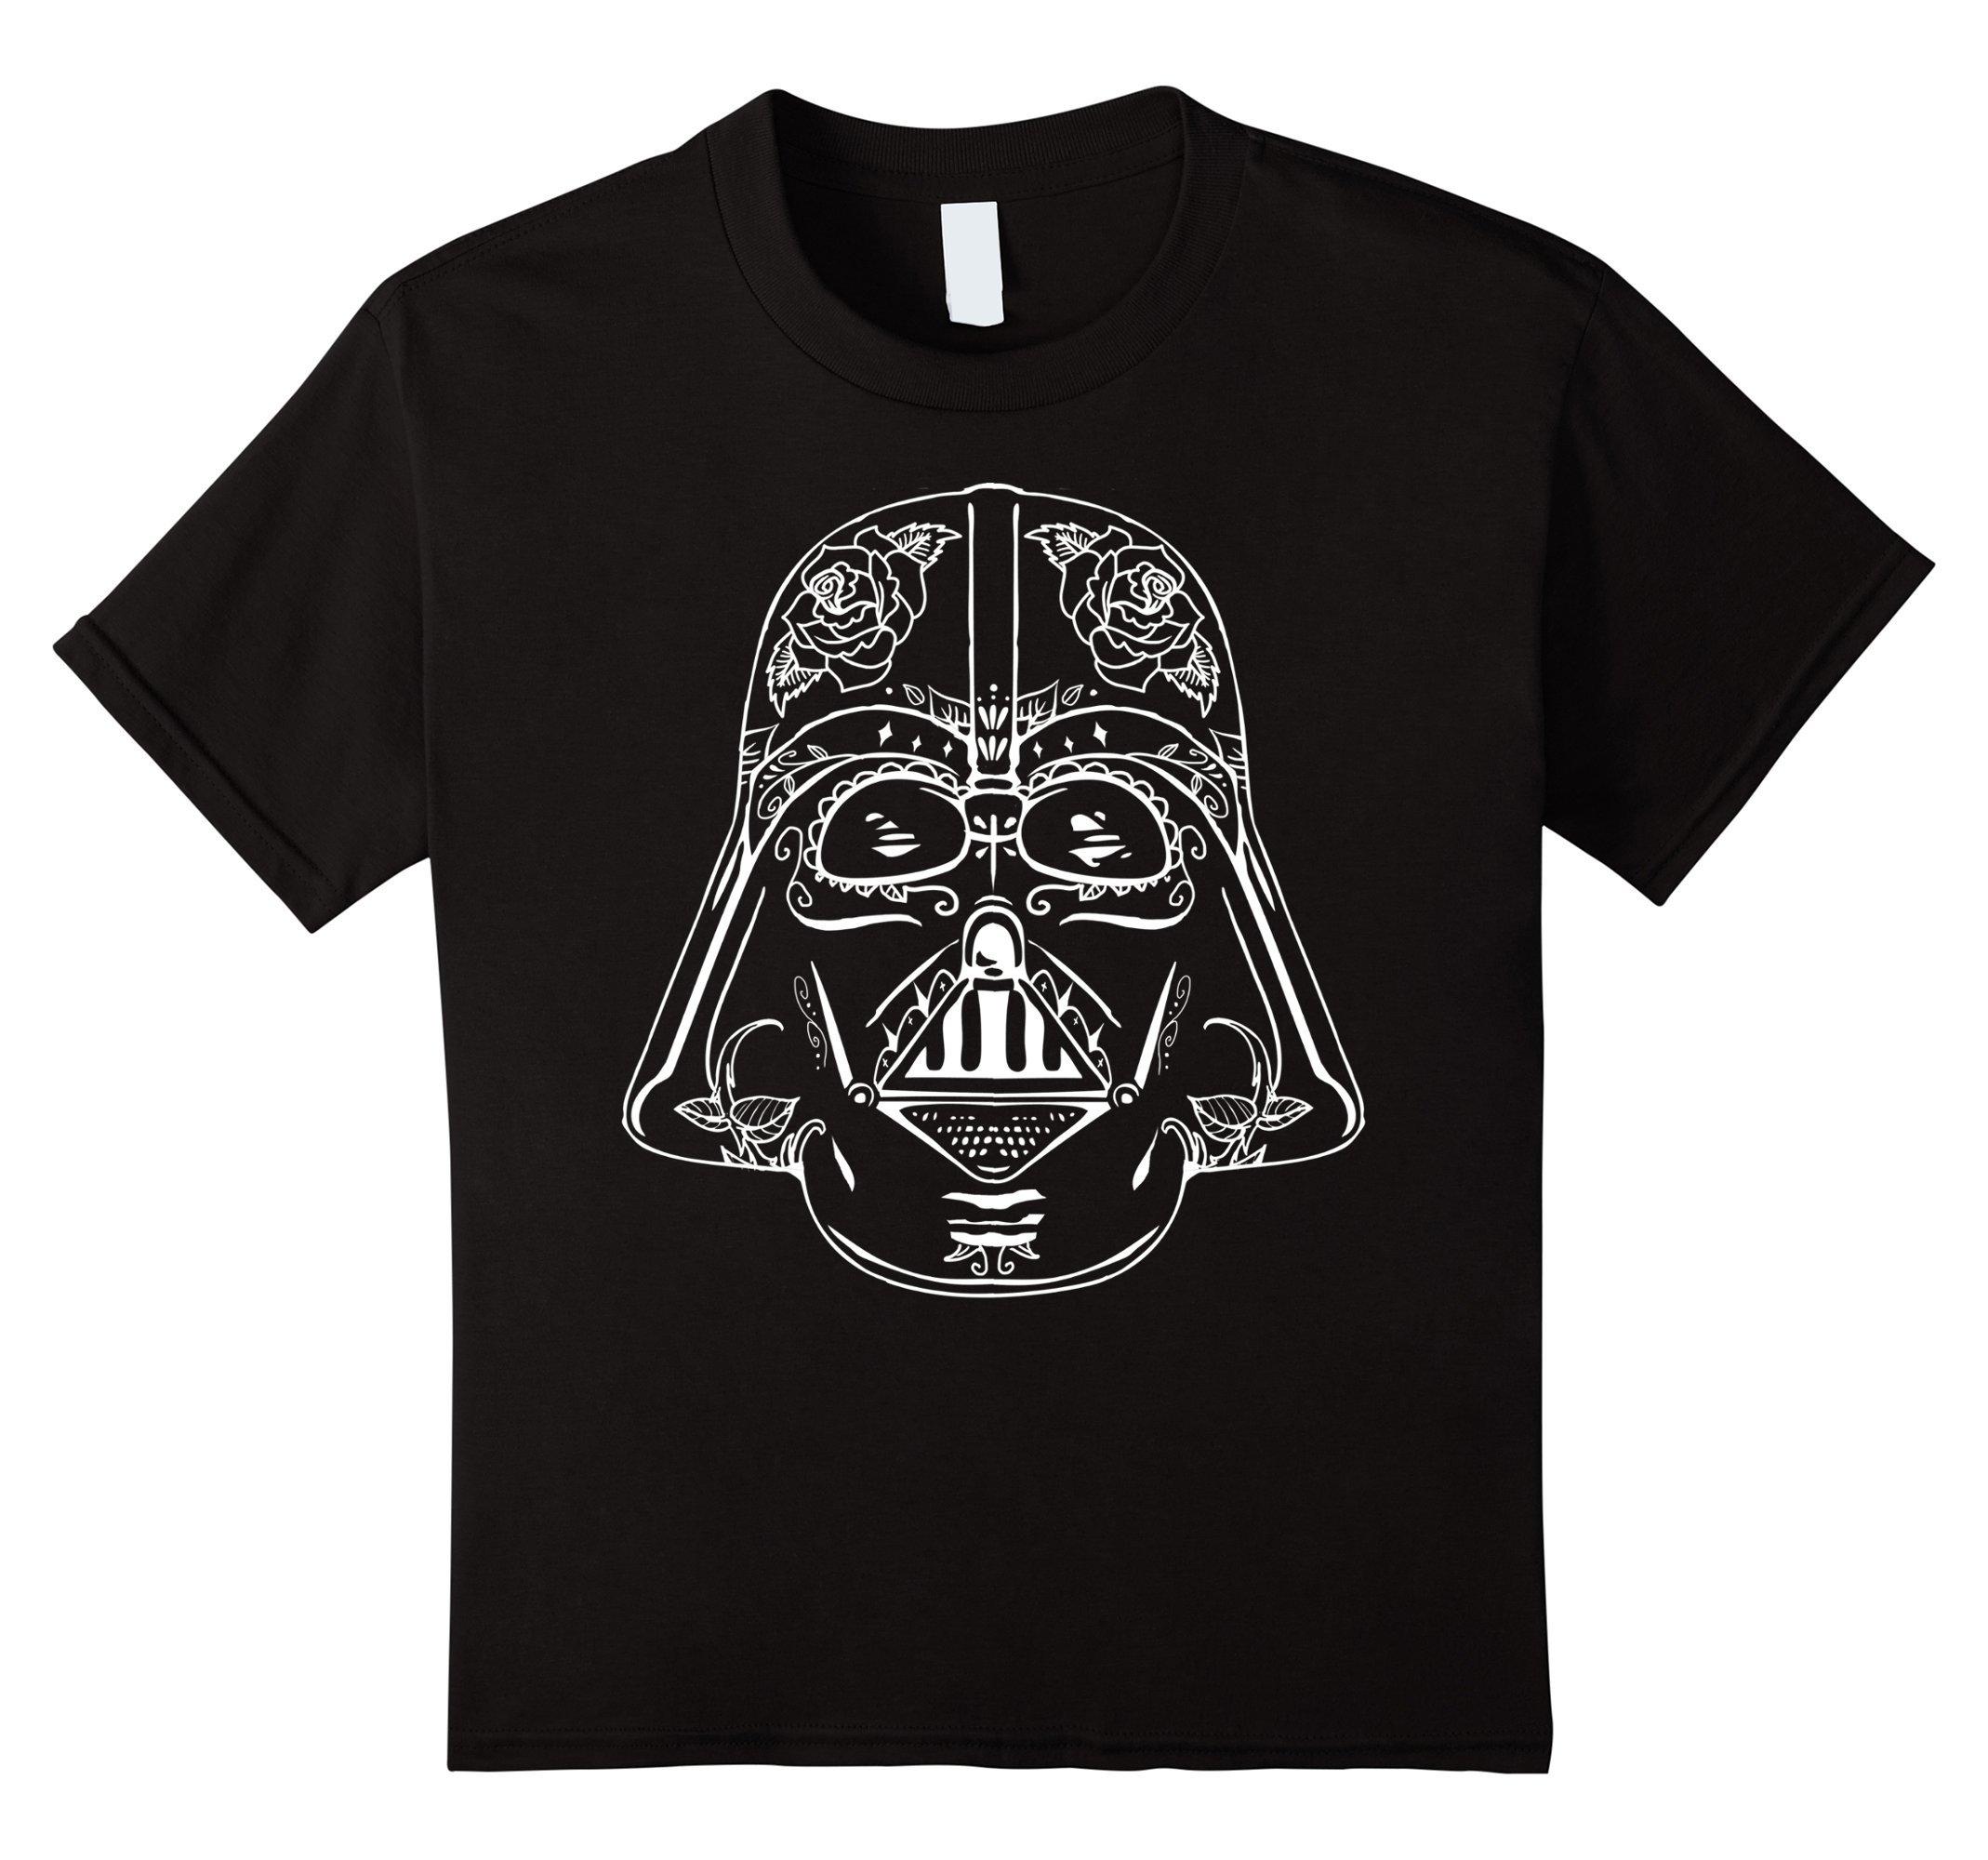 Star Wars Darth Vader Sugar Skull Classic Graphic T Shirt